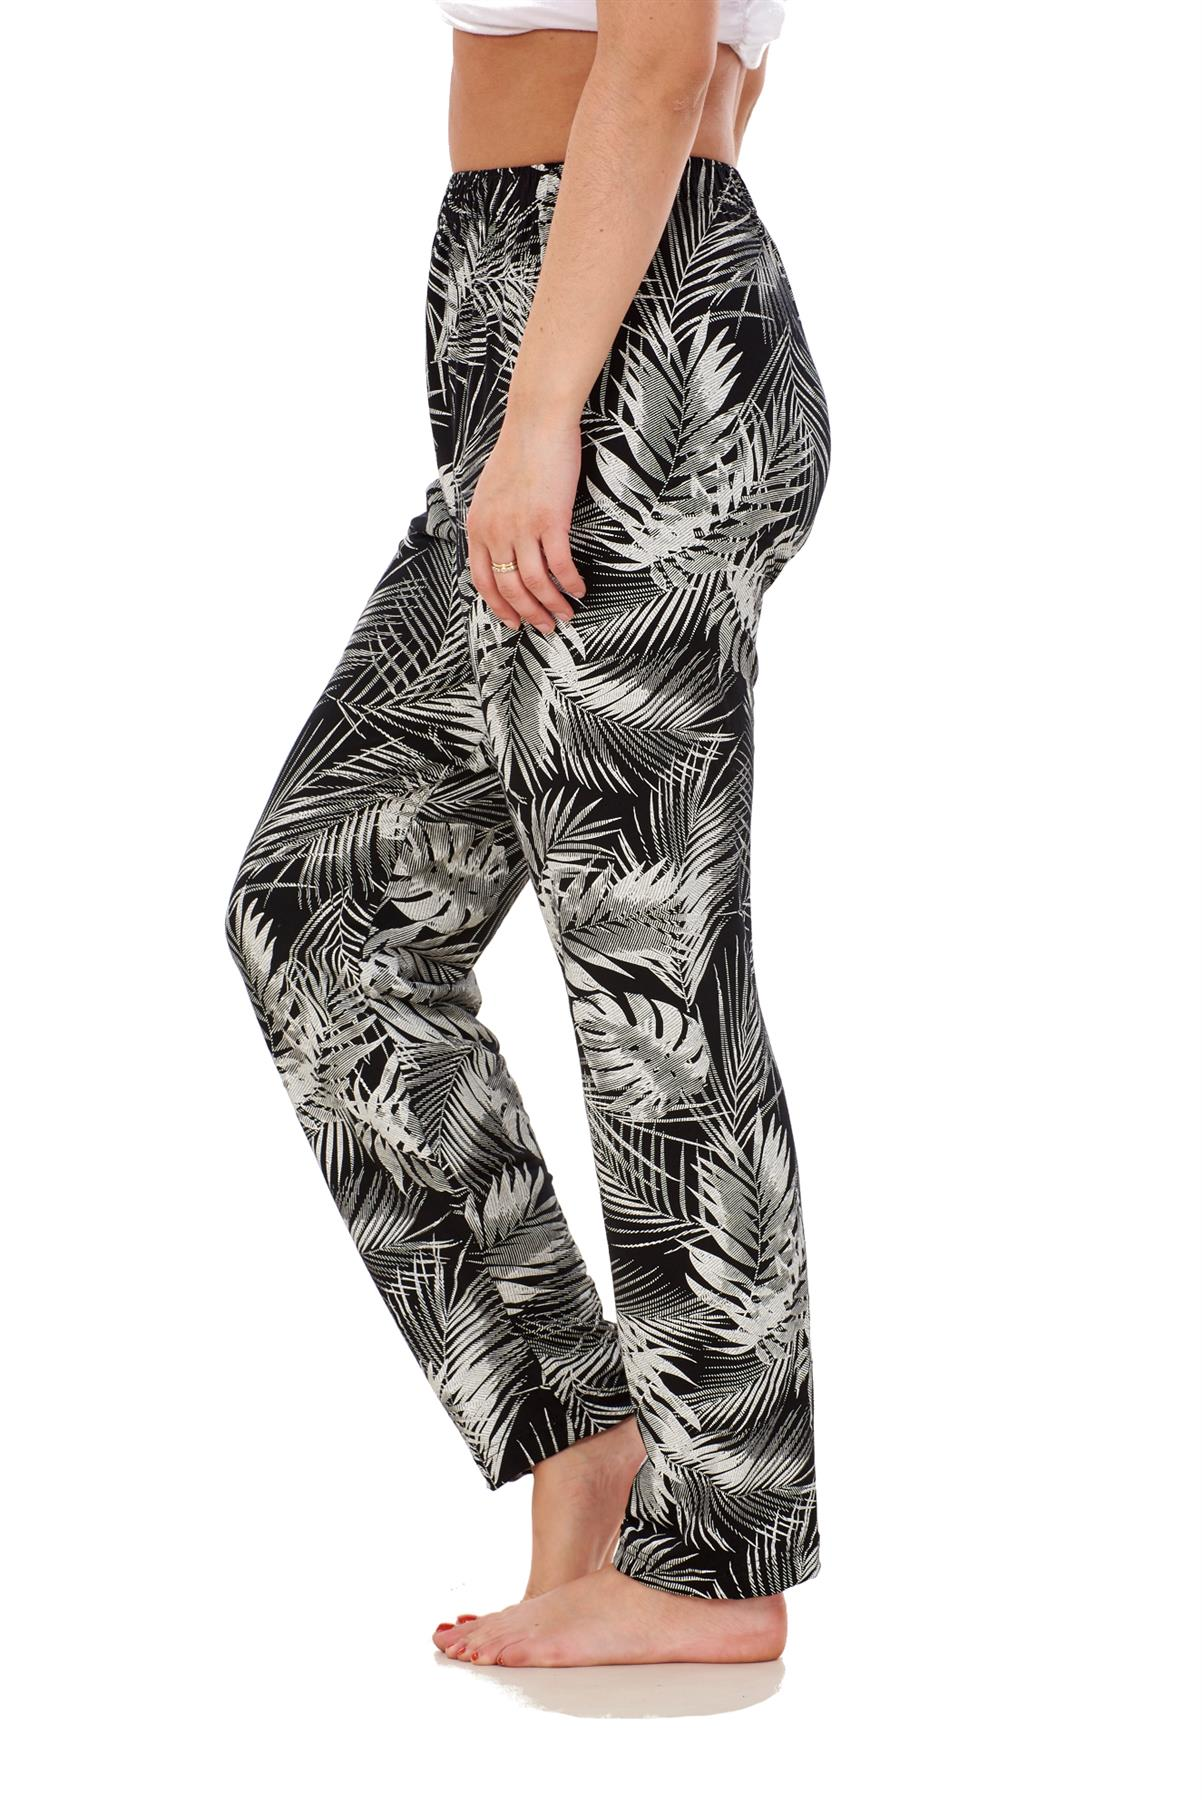 Ladies-Women-Trouser-Elasticated-Printed-Tapered-Harem-High-waist-Regular-Pants thumbnail 23